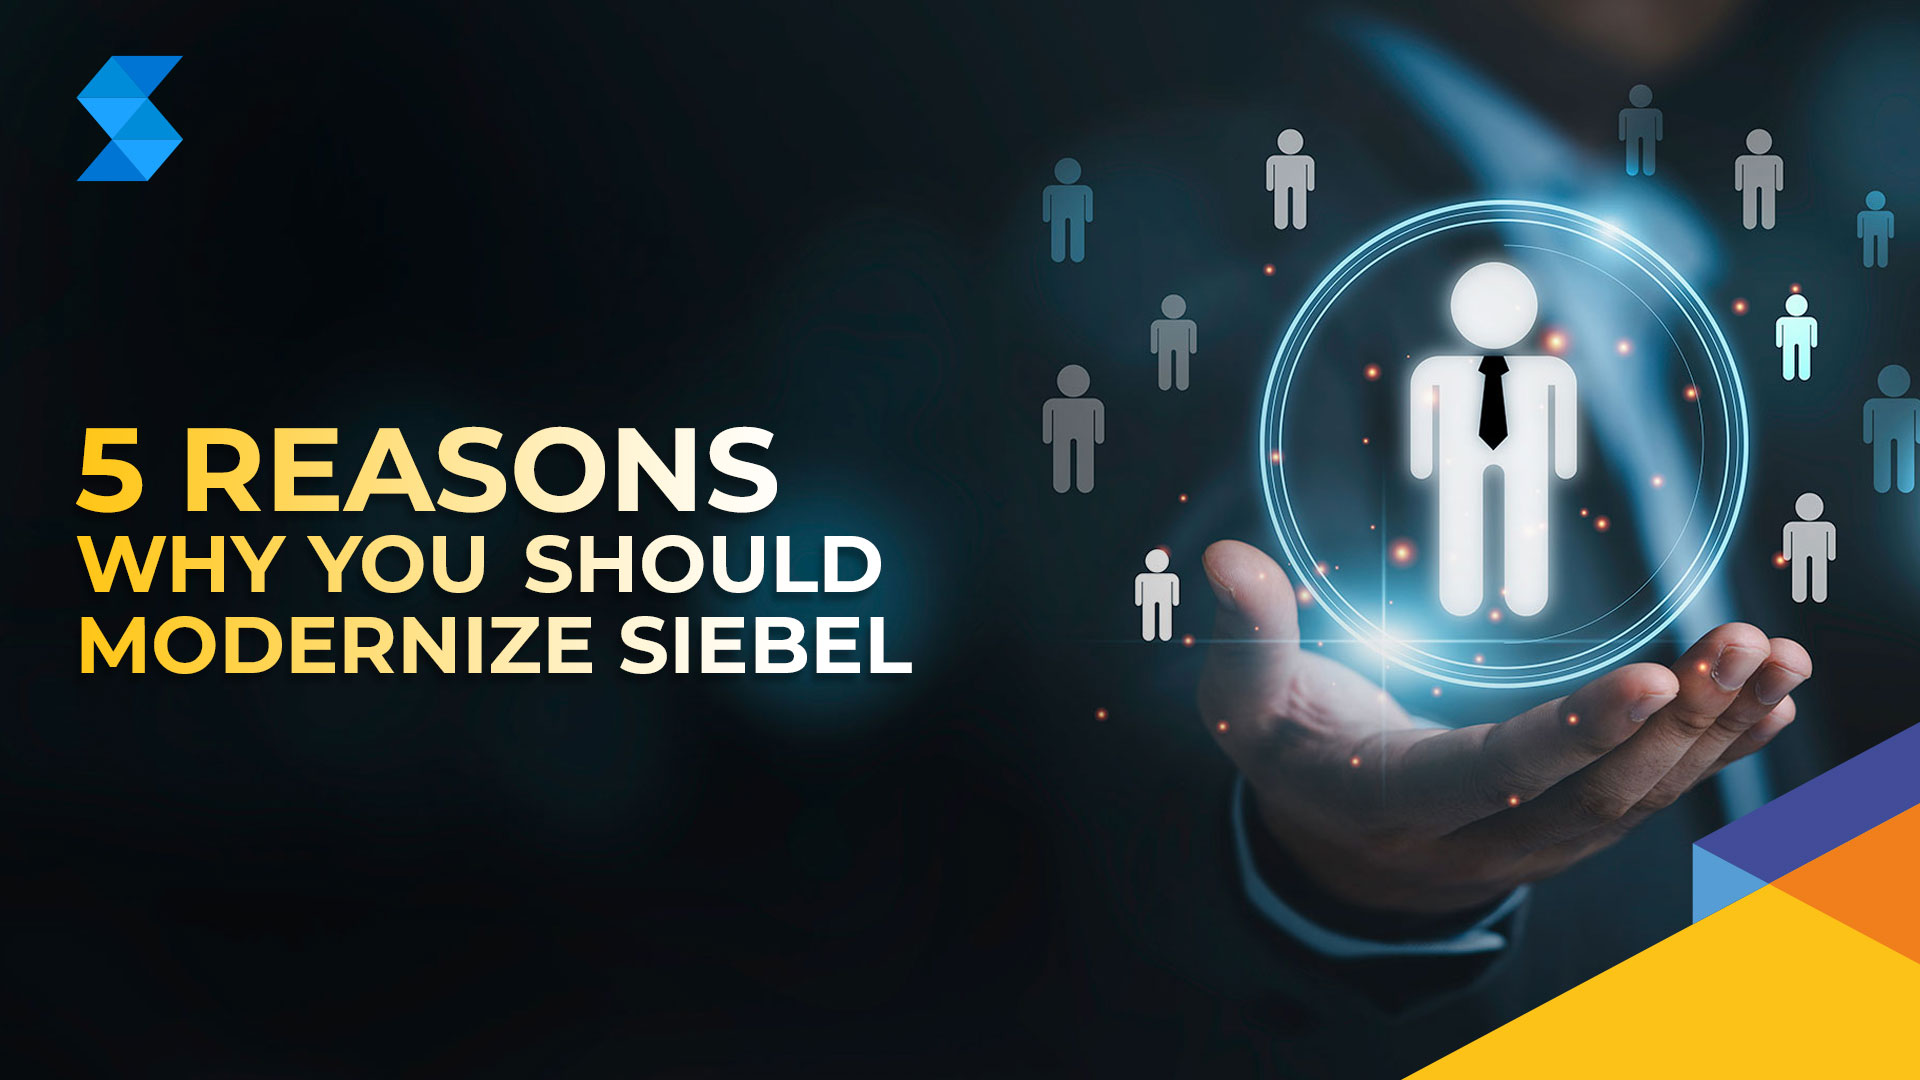 5 Reasons Why You Should Modernize Siebel